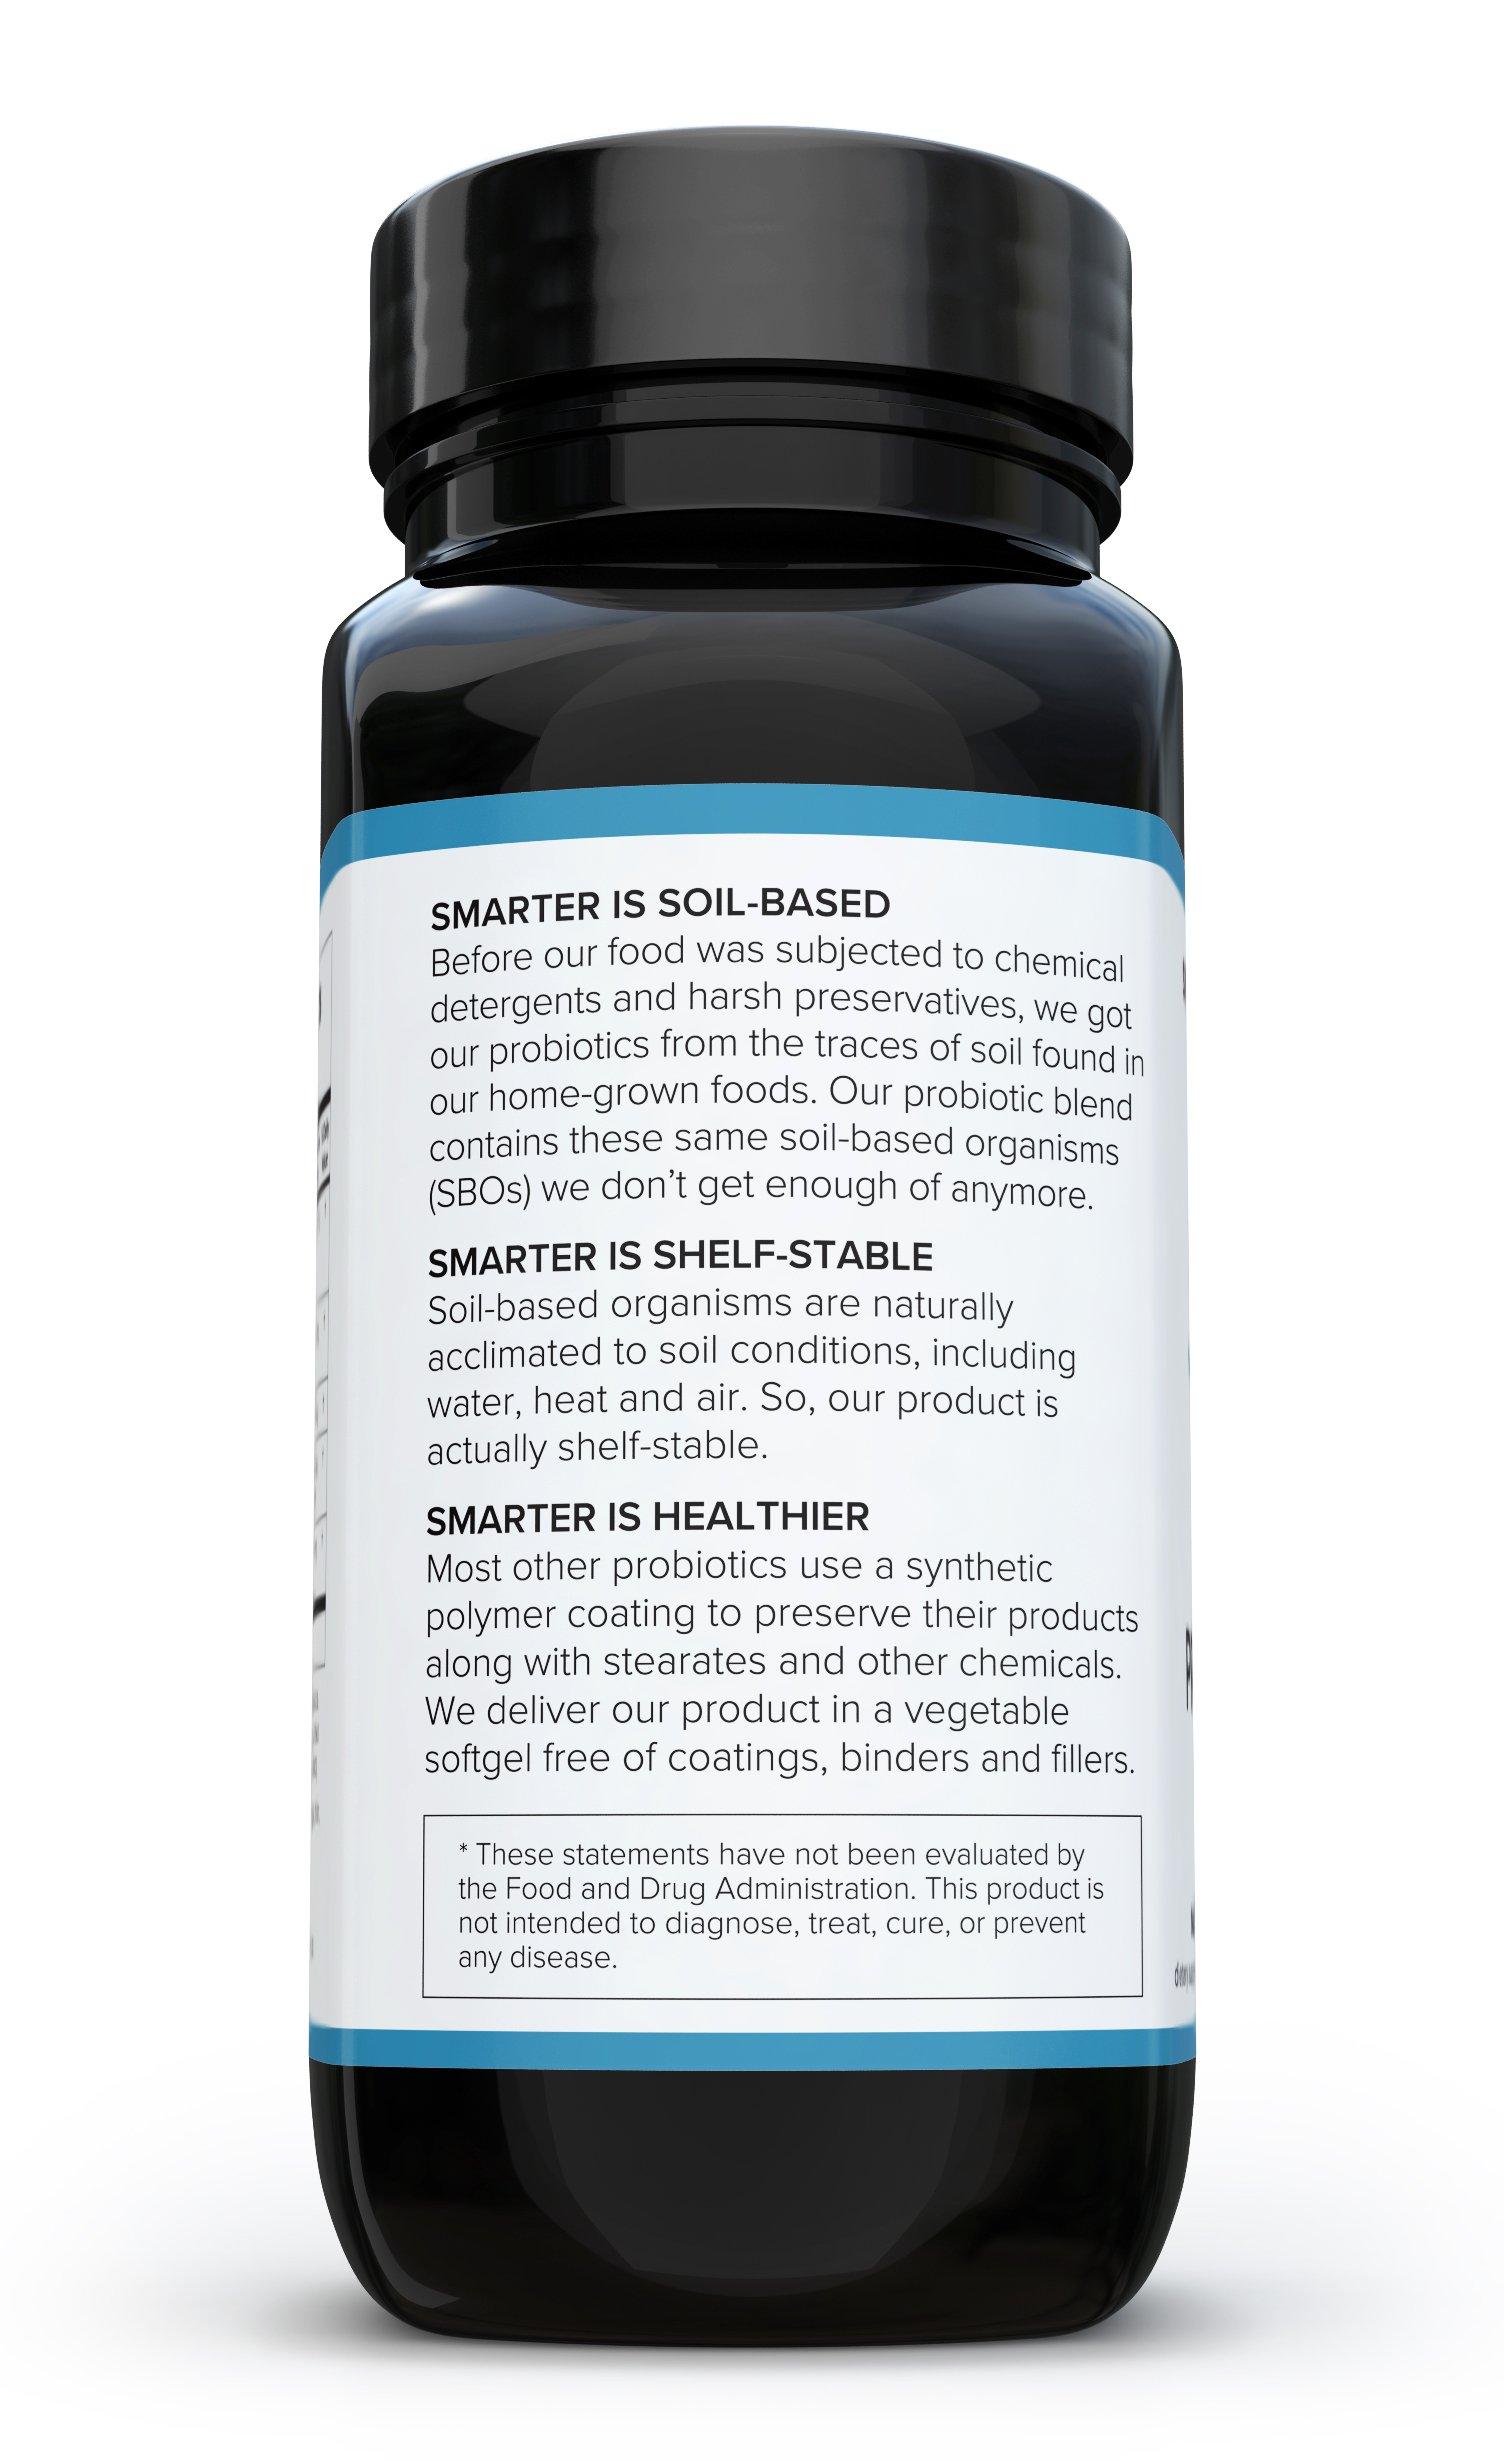 Smarter Probiotics - Superior Digestive & Immune Support from 100% Soil-Based Probiotic (3 Month Supply)